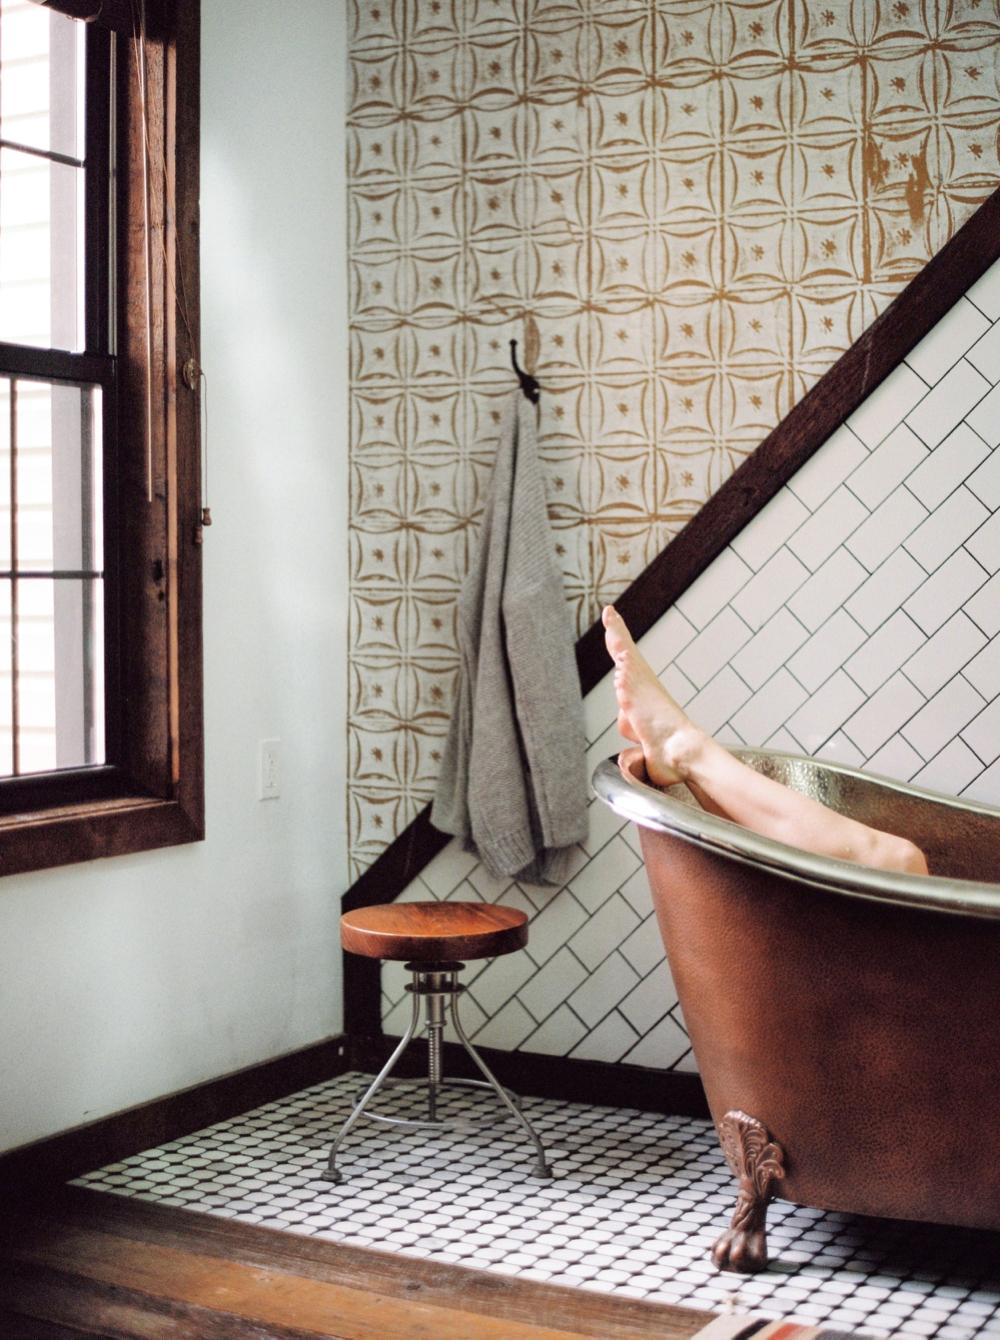 Fashion Blogger | Bath Tub Photos | Fashion Photographer New York City | Urban Cowboy Bnb Treehouse